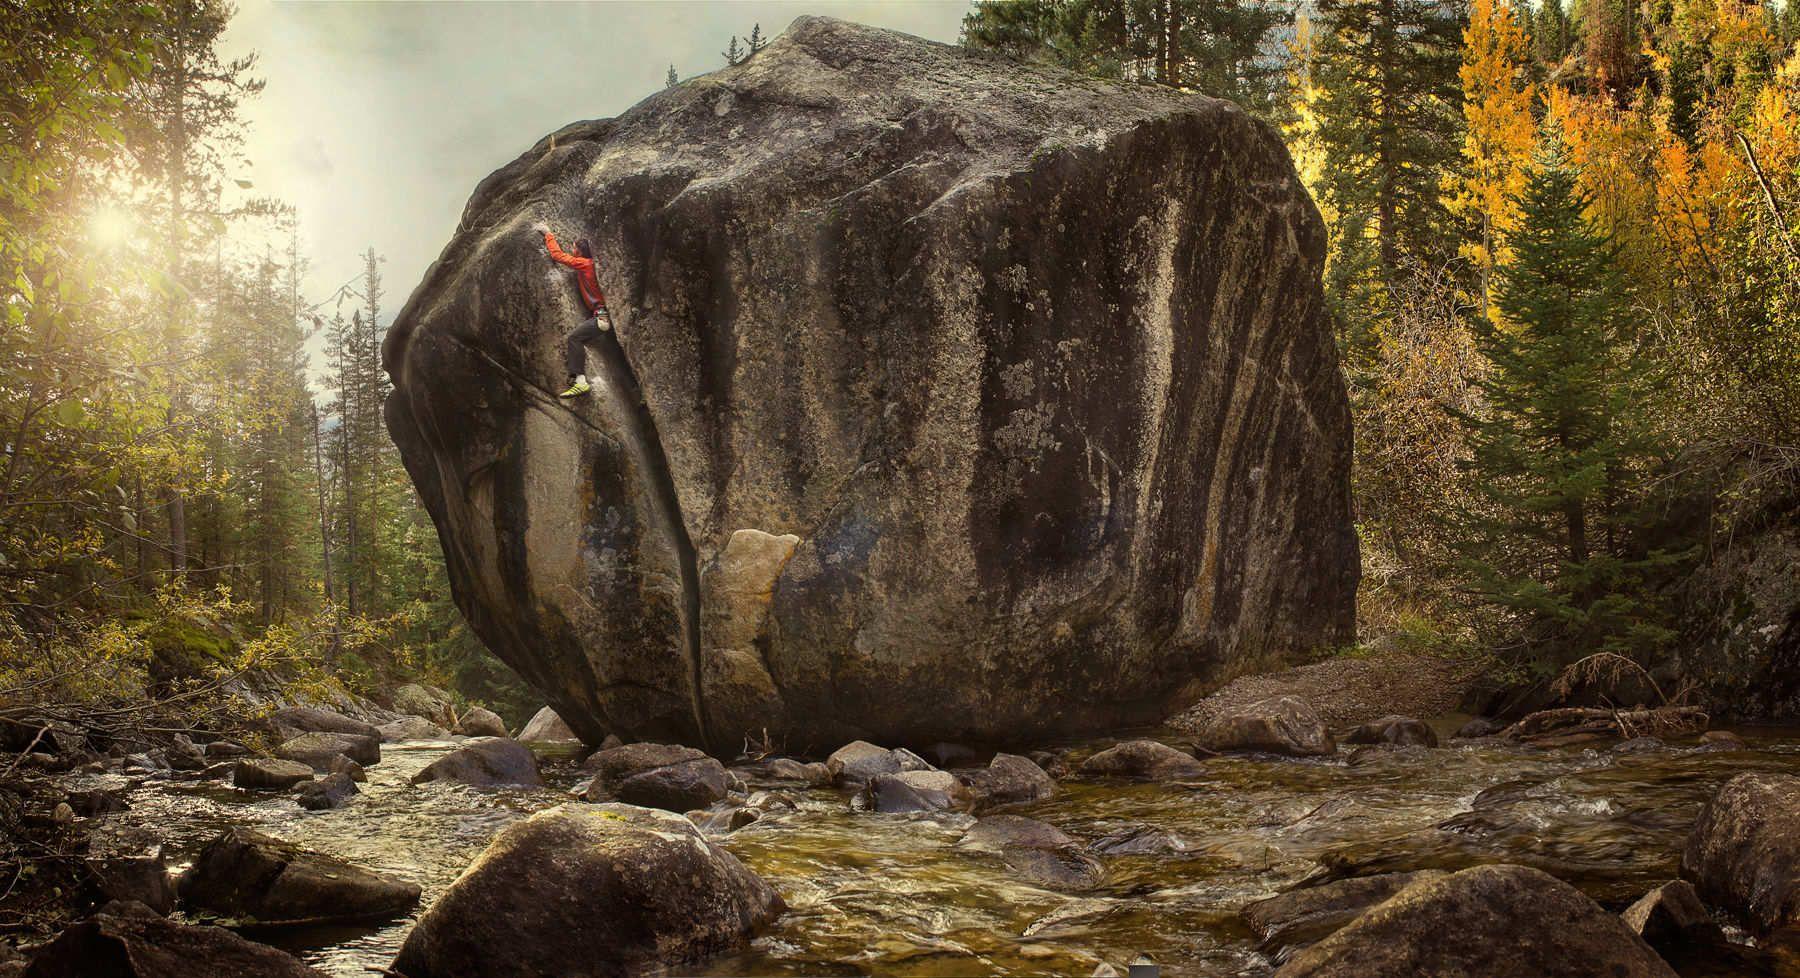 1wilzfoto_adidas_boulder_24sept2012.jpg